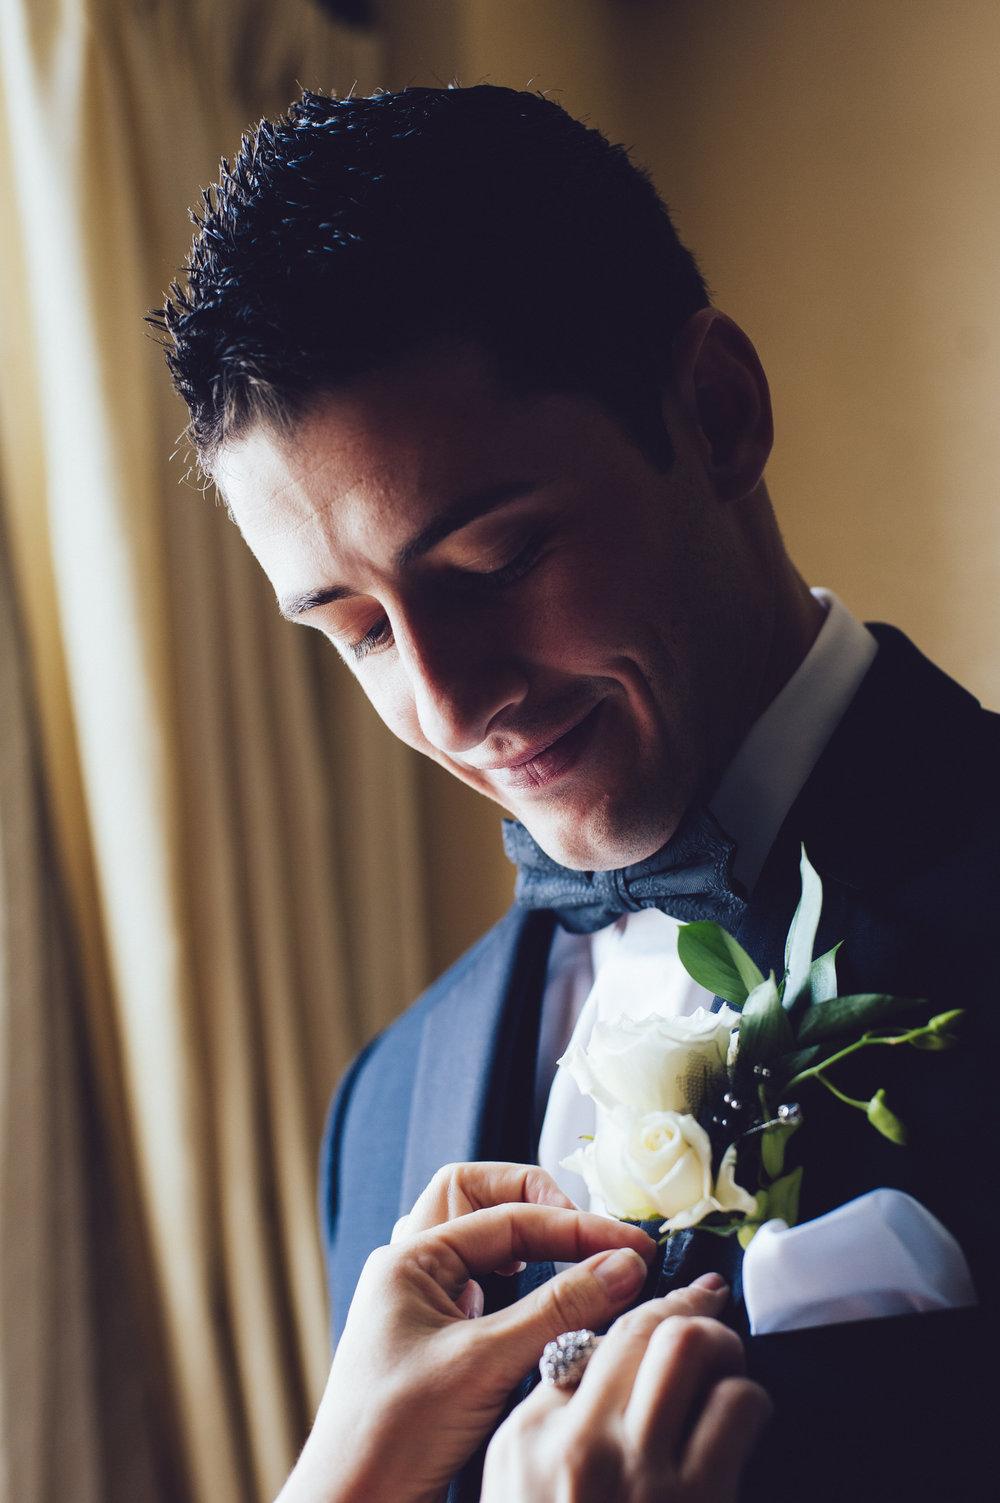 10 Hotel DuPont Wedding Designer Philadelphia Wedding Florist Grooms Boutonniere.jpg